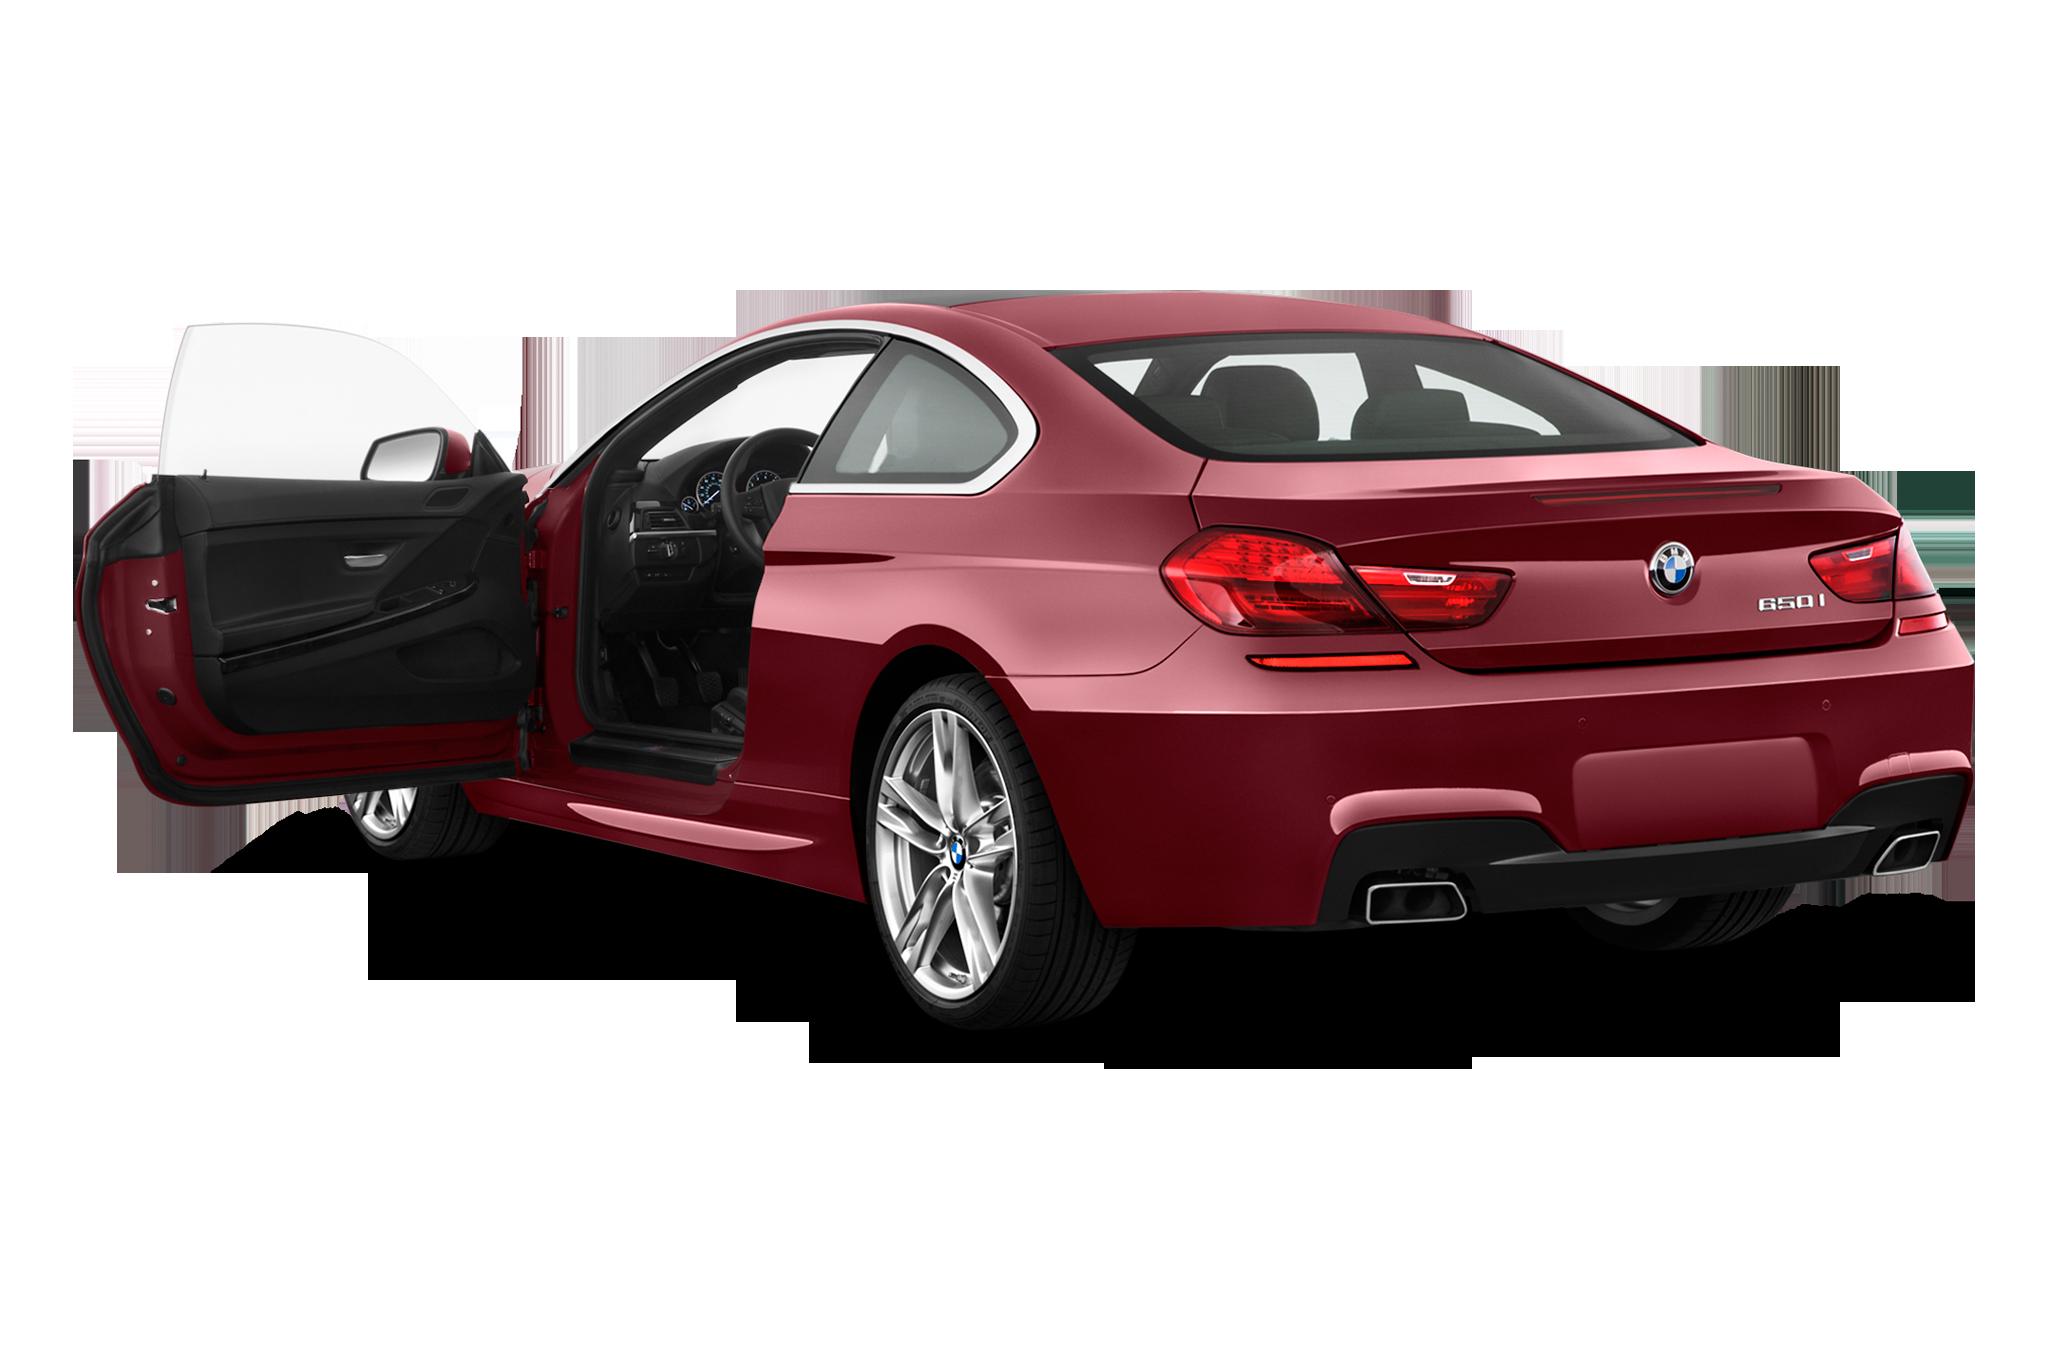 2015 bmw alpina b6 xdrive gran coupe review automobile magazine. Black Bedroom Furniture Sets. Home Design Ideas